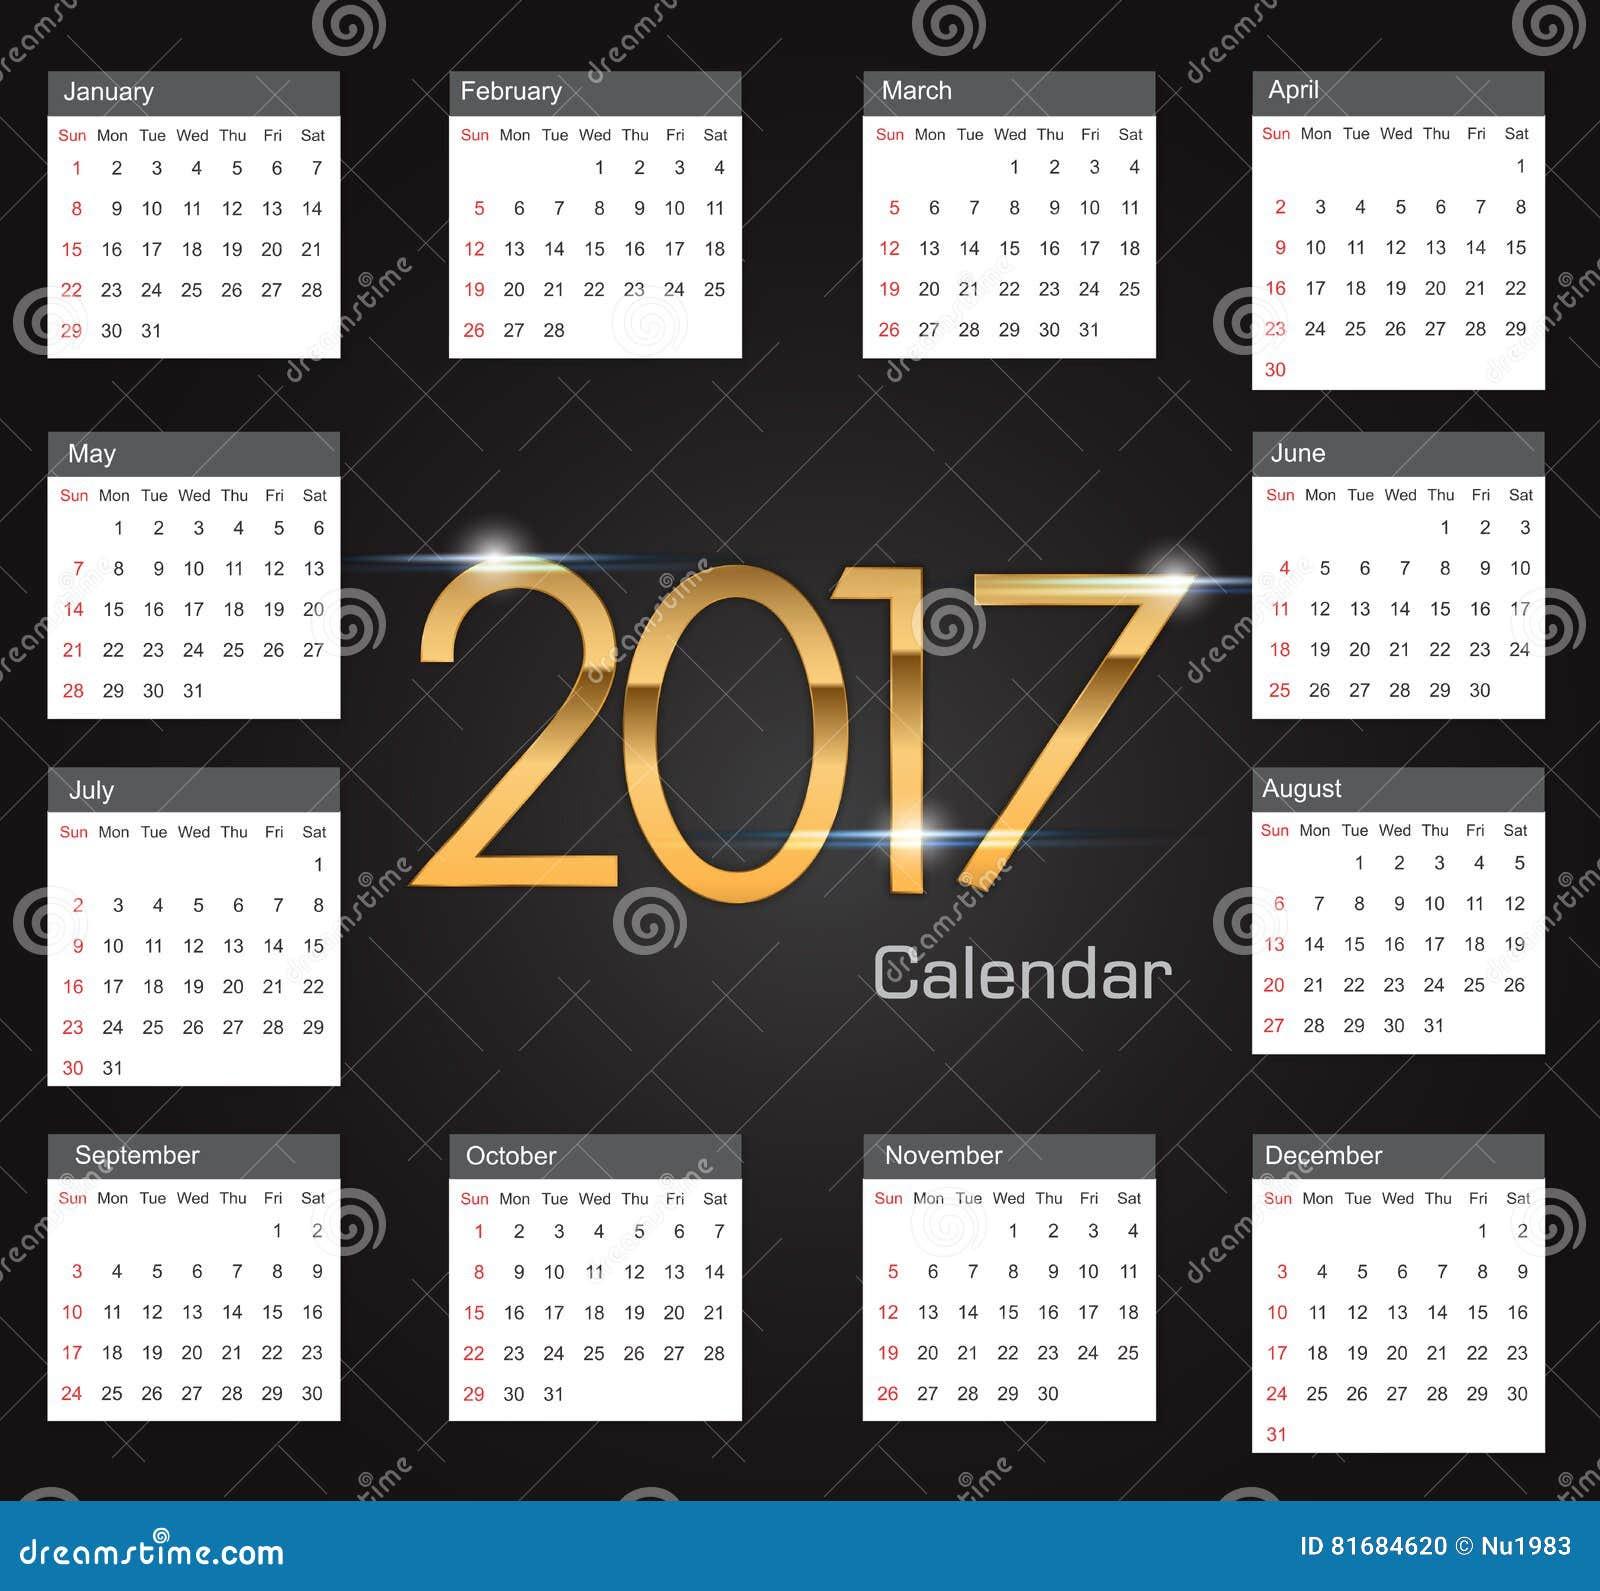 Gold 2017 Luxury Editable Calendar Stock Vector - Image: 81684620